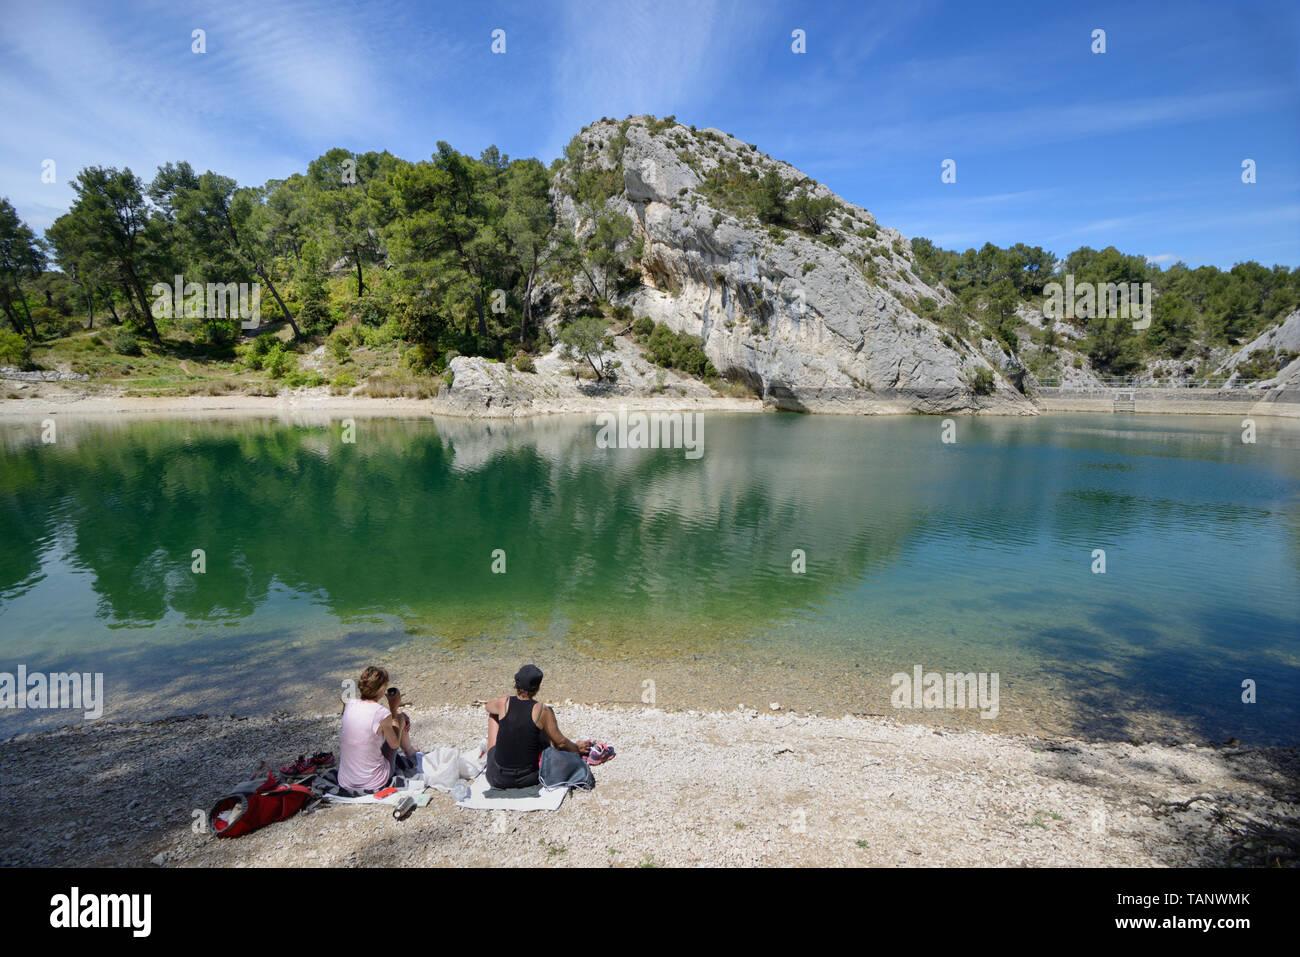 A Couple Picnicking at Peiroou Lake, Lac de Peirou, or Glanum Barrage in the Alpilles Hills near Glanum, Saint Remy-de-Provence Provence France - Stock Image